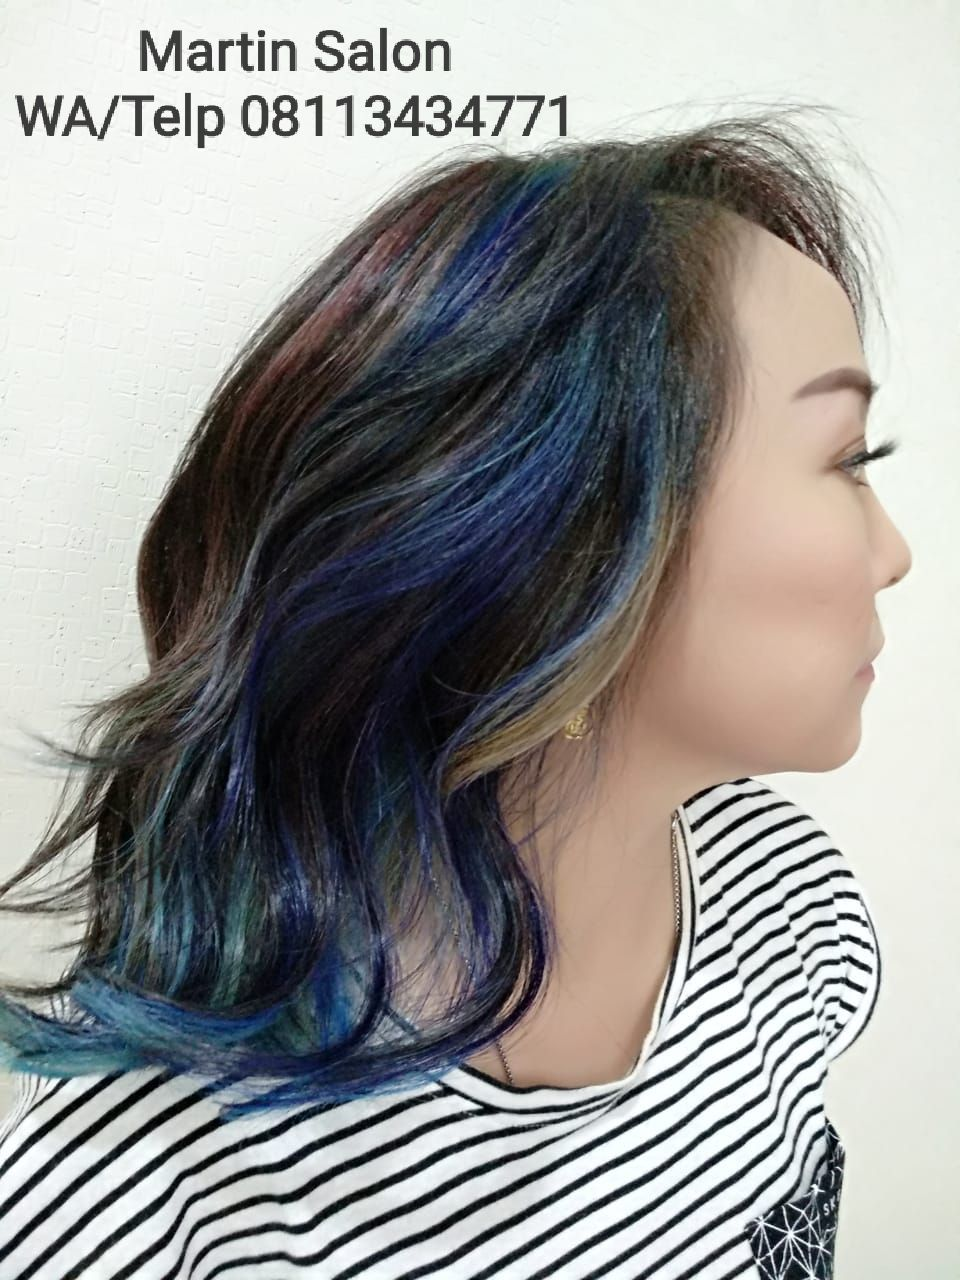 Warna Rambut Wa Telp 0811 3434 773 Hair Styles Long Hair Styles Beauty